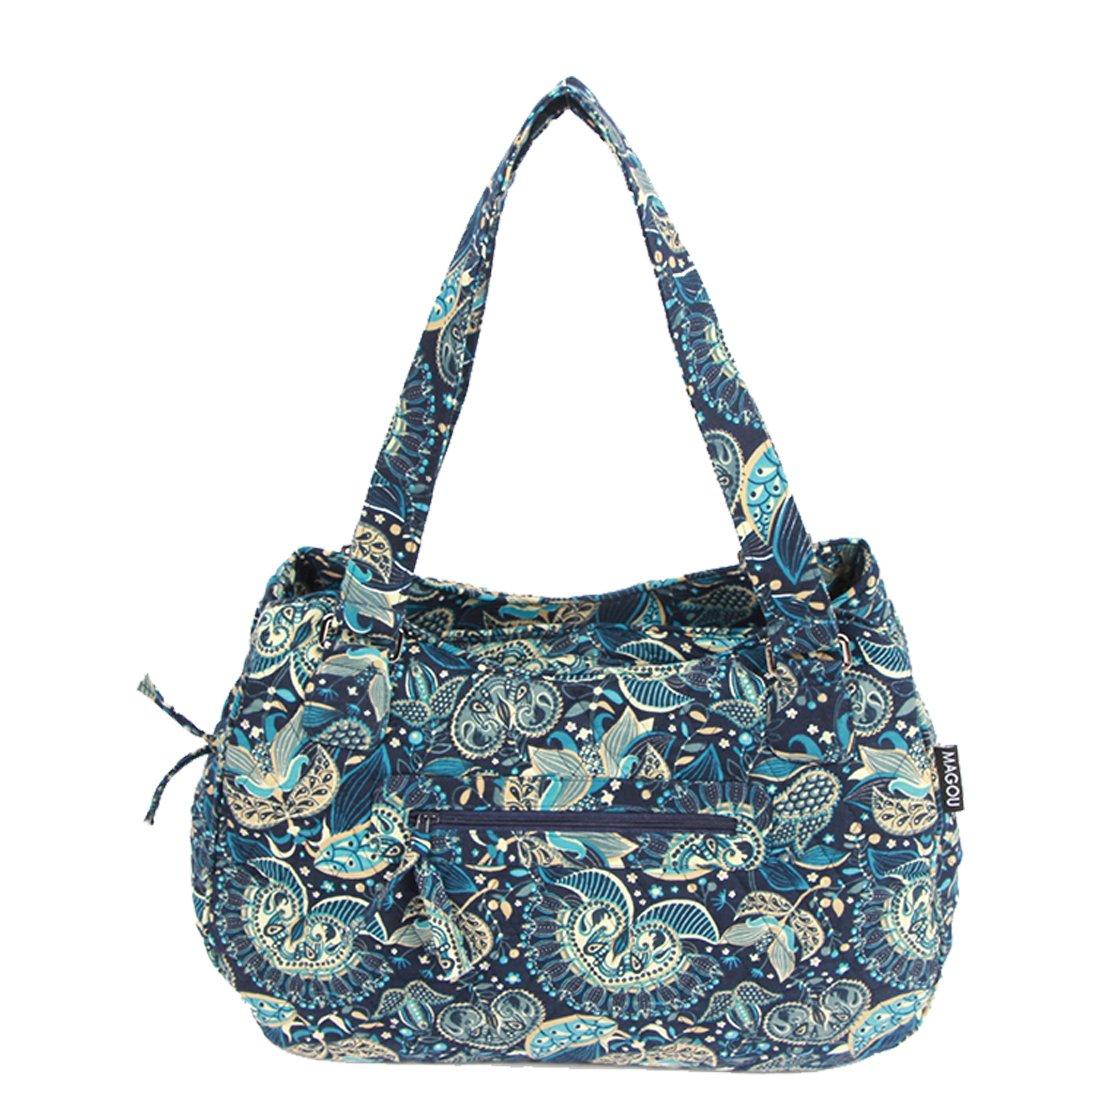 MAGOU Quilted Cotton Handle Bags Shoulder Bag (Peacock Blue)